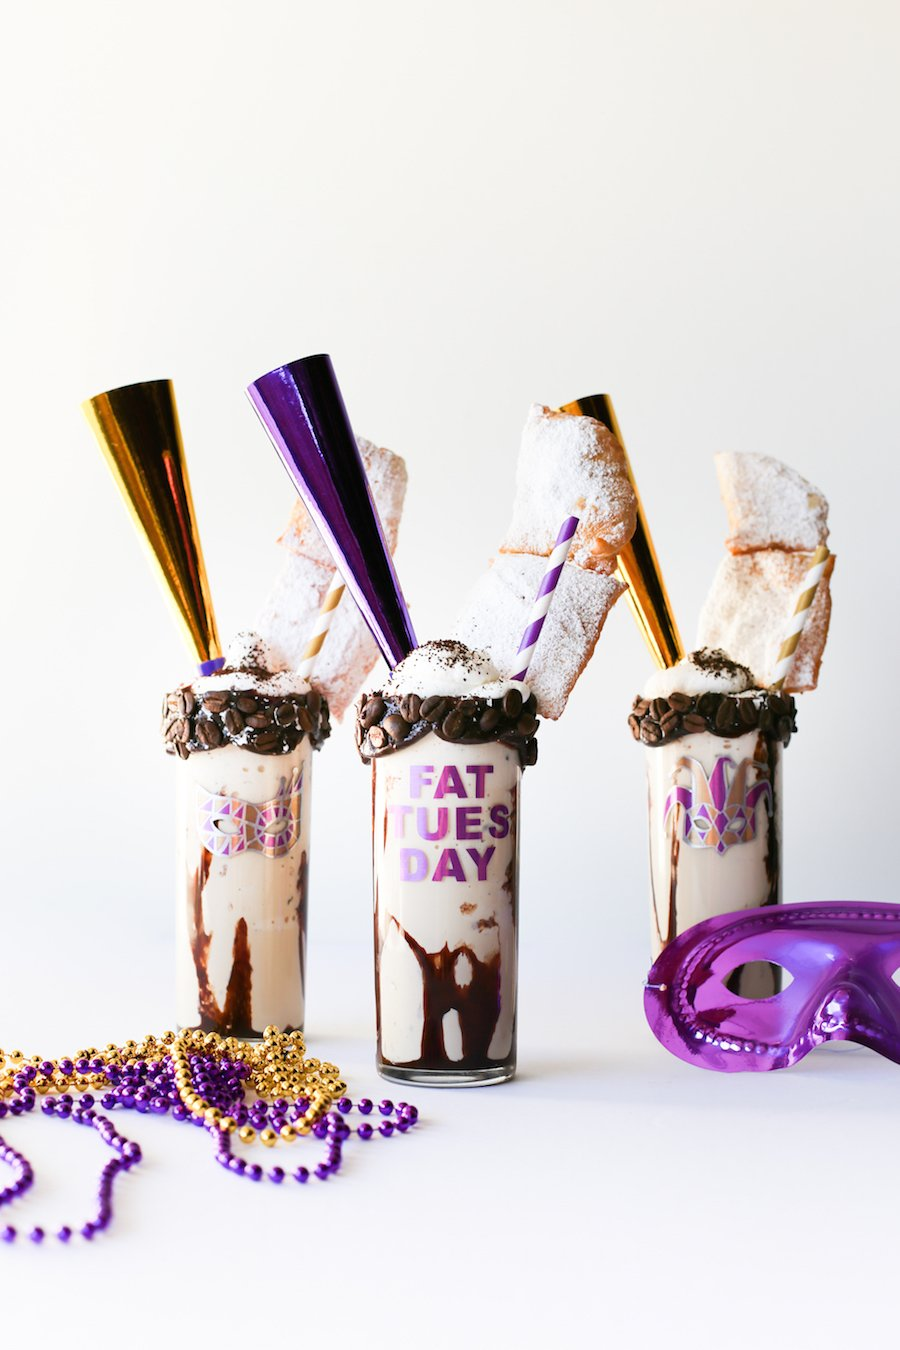 Mardi Gras Milkshakes // Coffee Milkshakes topped with Beignets // Salty Canary